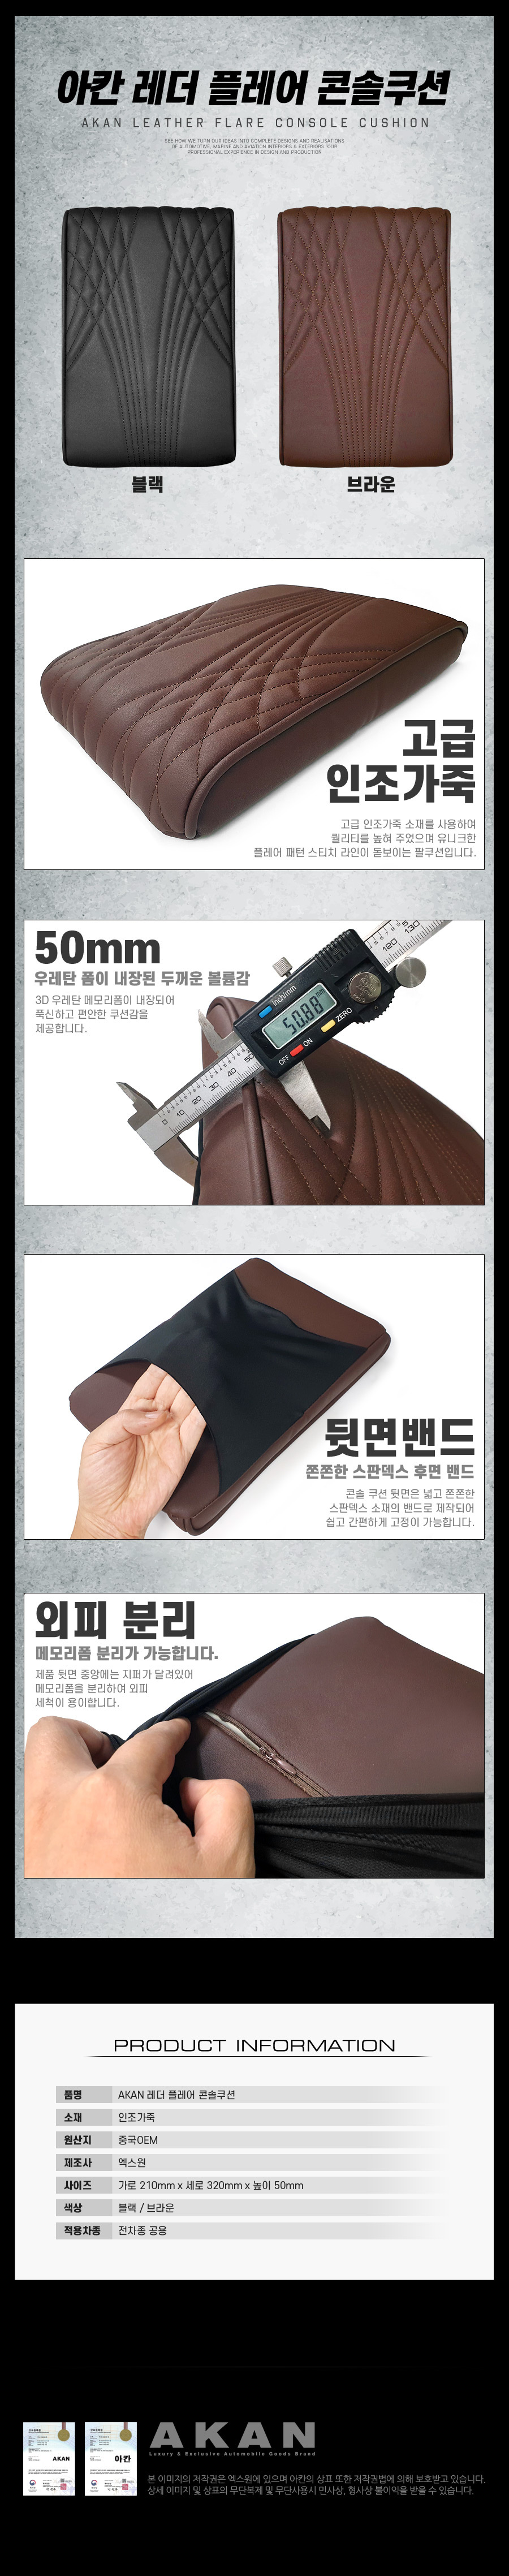 leather-flare-console-cushion_08.jpg